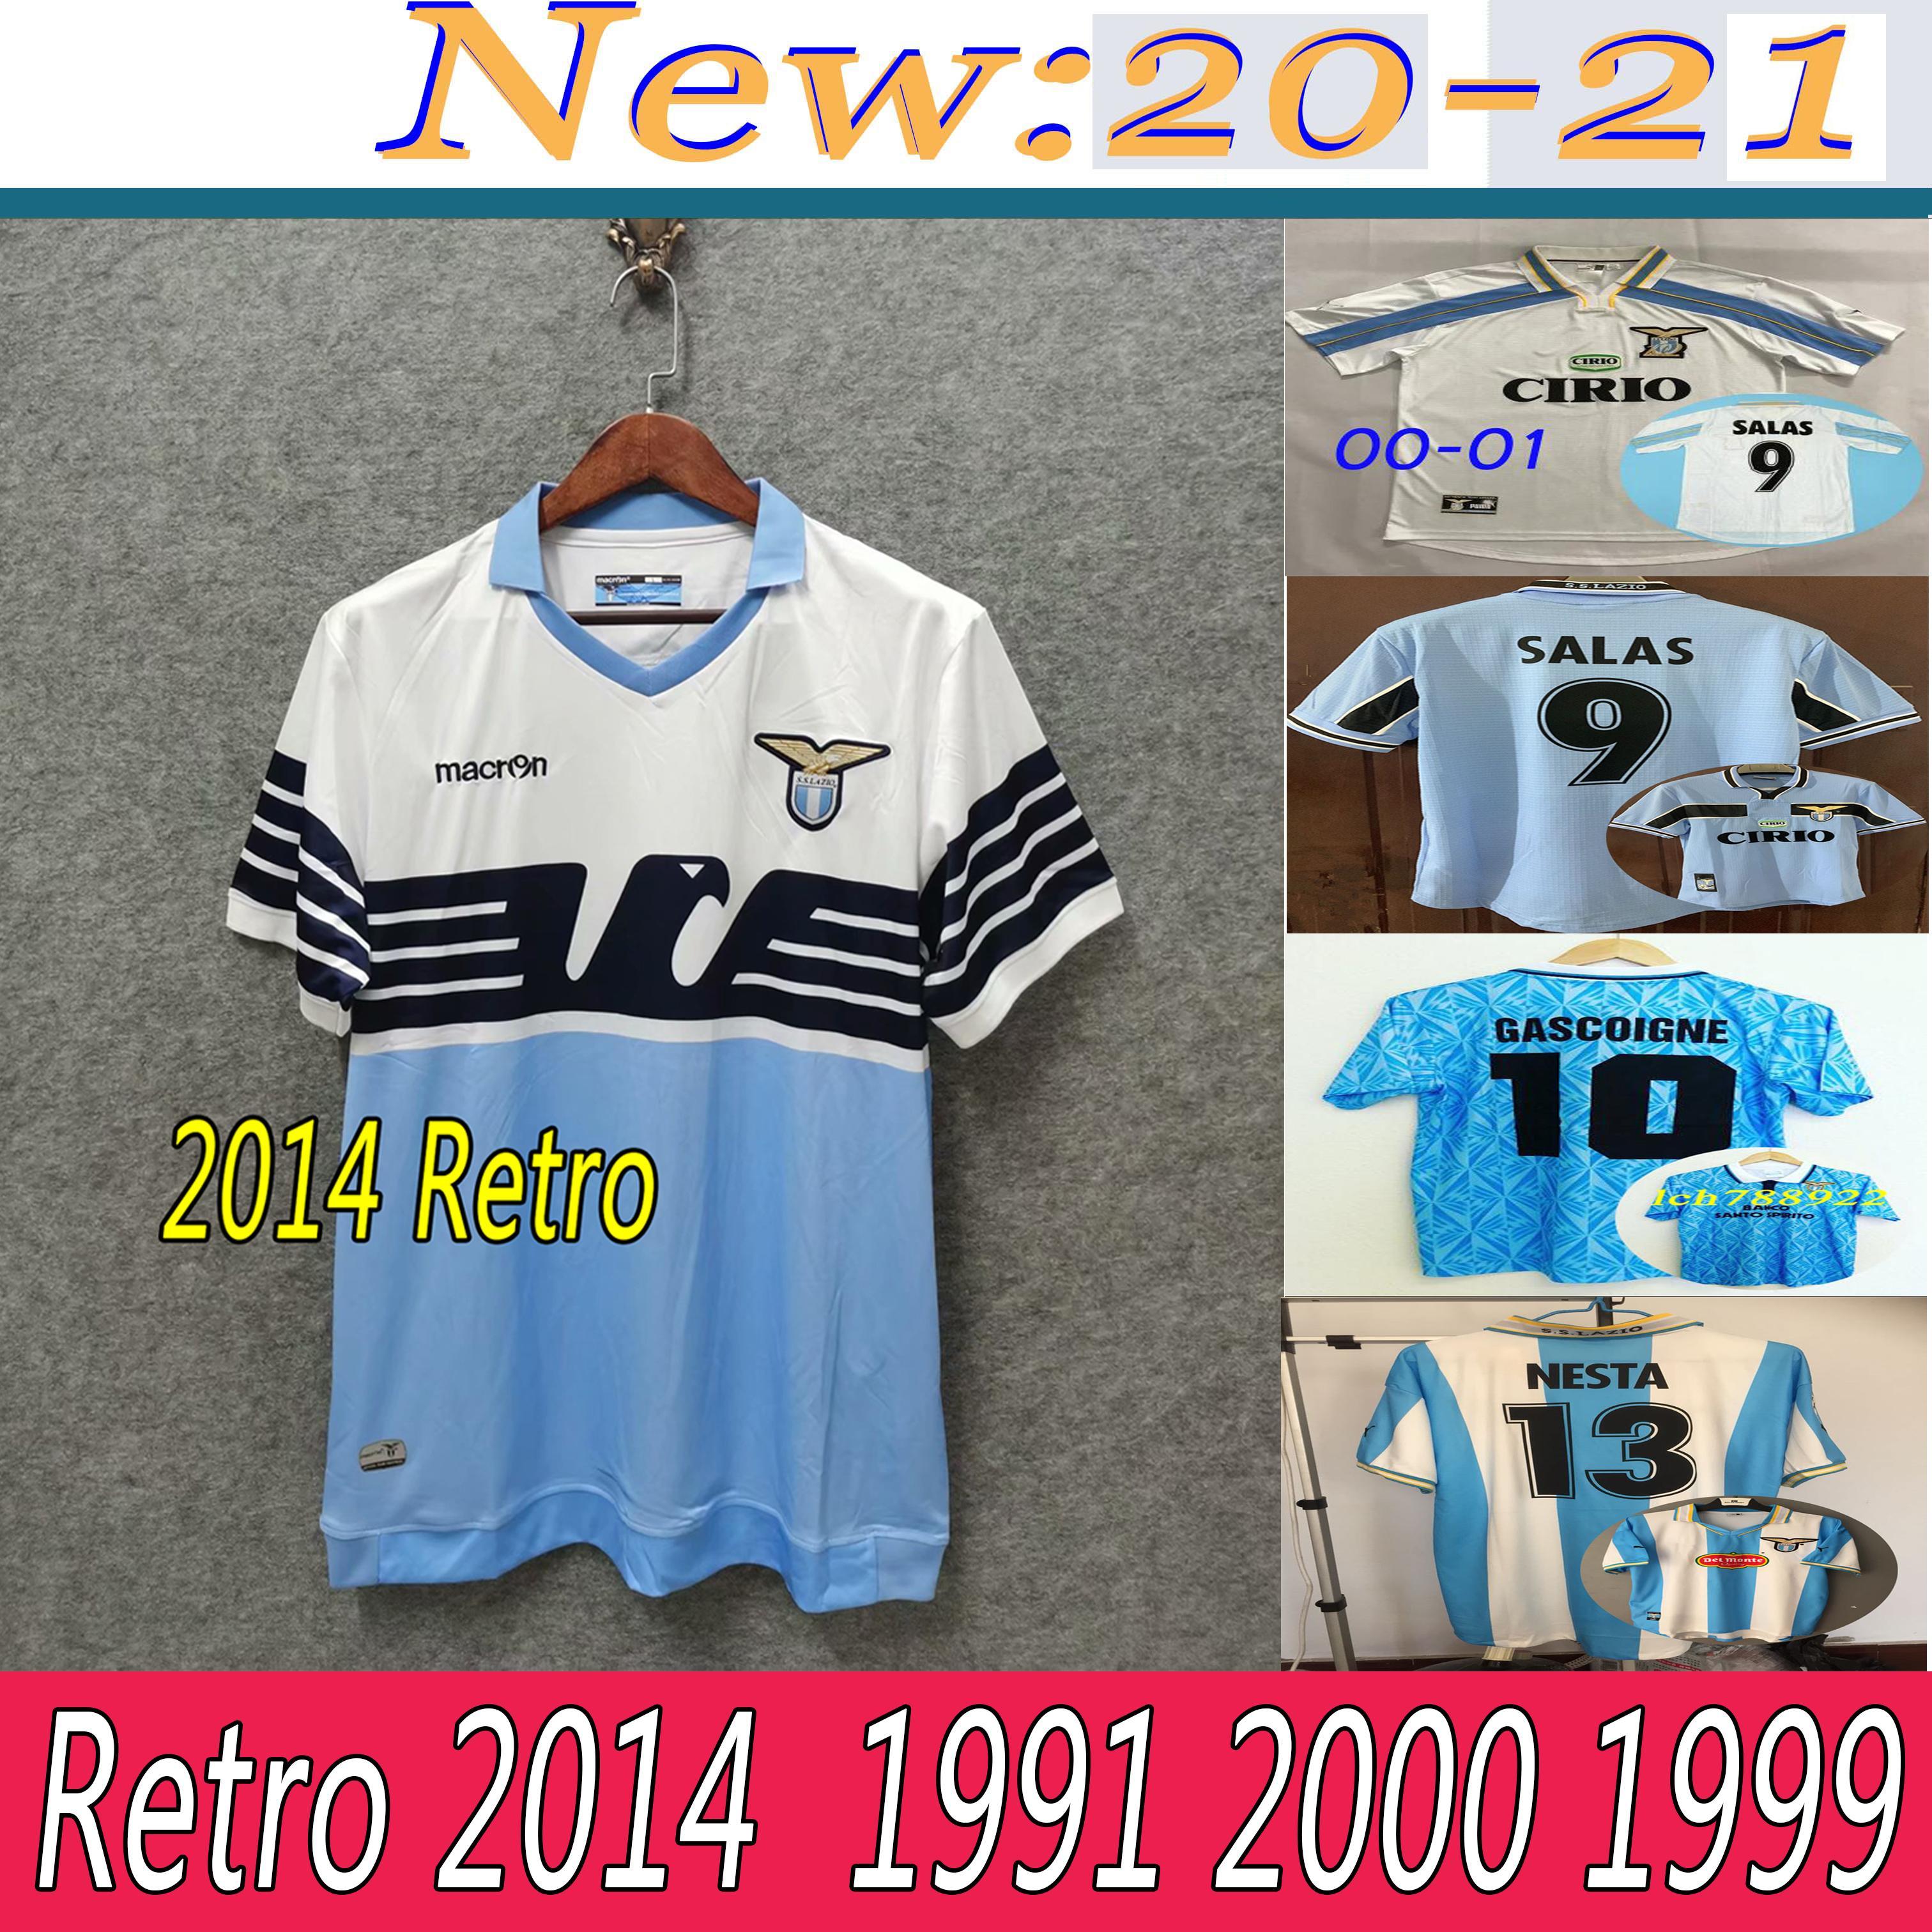 1998 00 01 01 Lazio Europee Home Retro Soccer Jersey 1999 Salas Mihajlovic Veron Stankovic Mancini Nestved Nedved Inzaghi خمر كرة القدم قميص